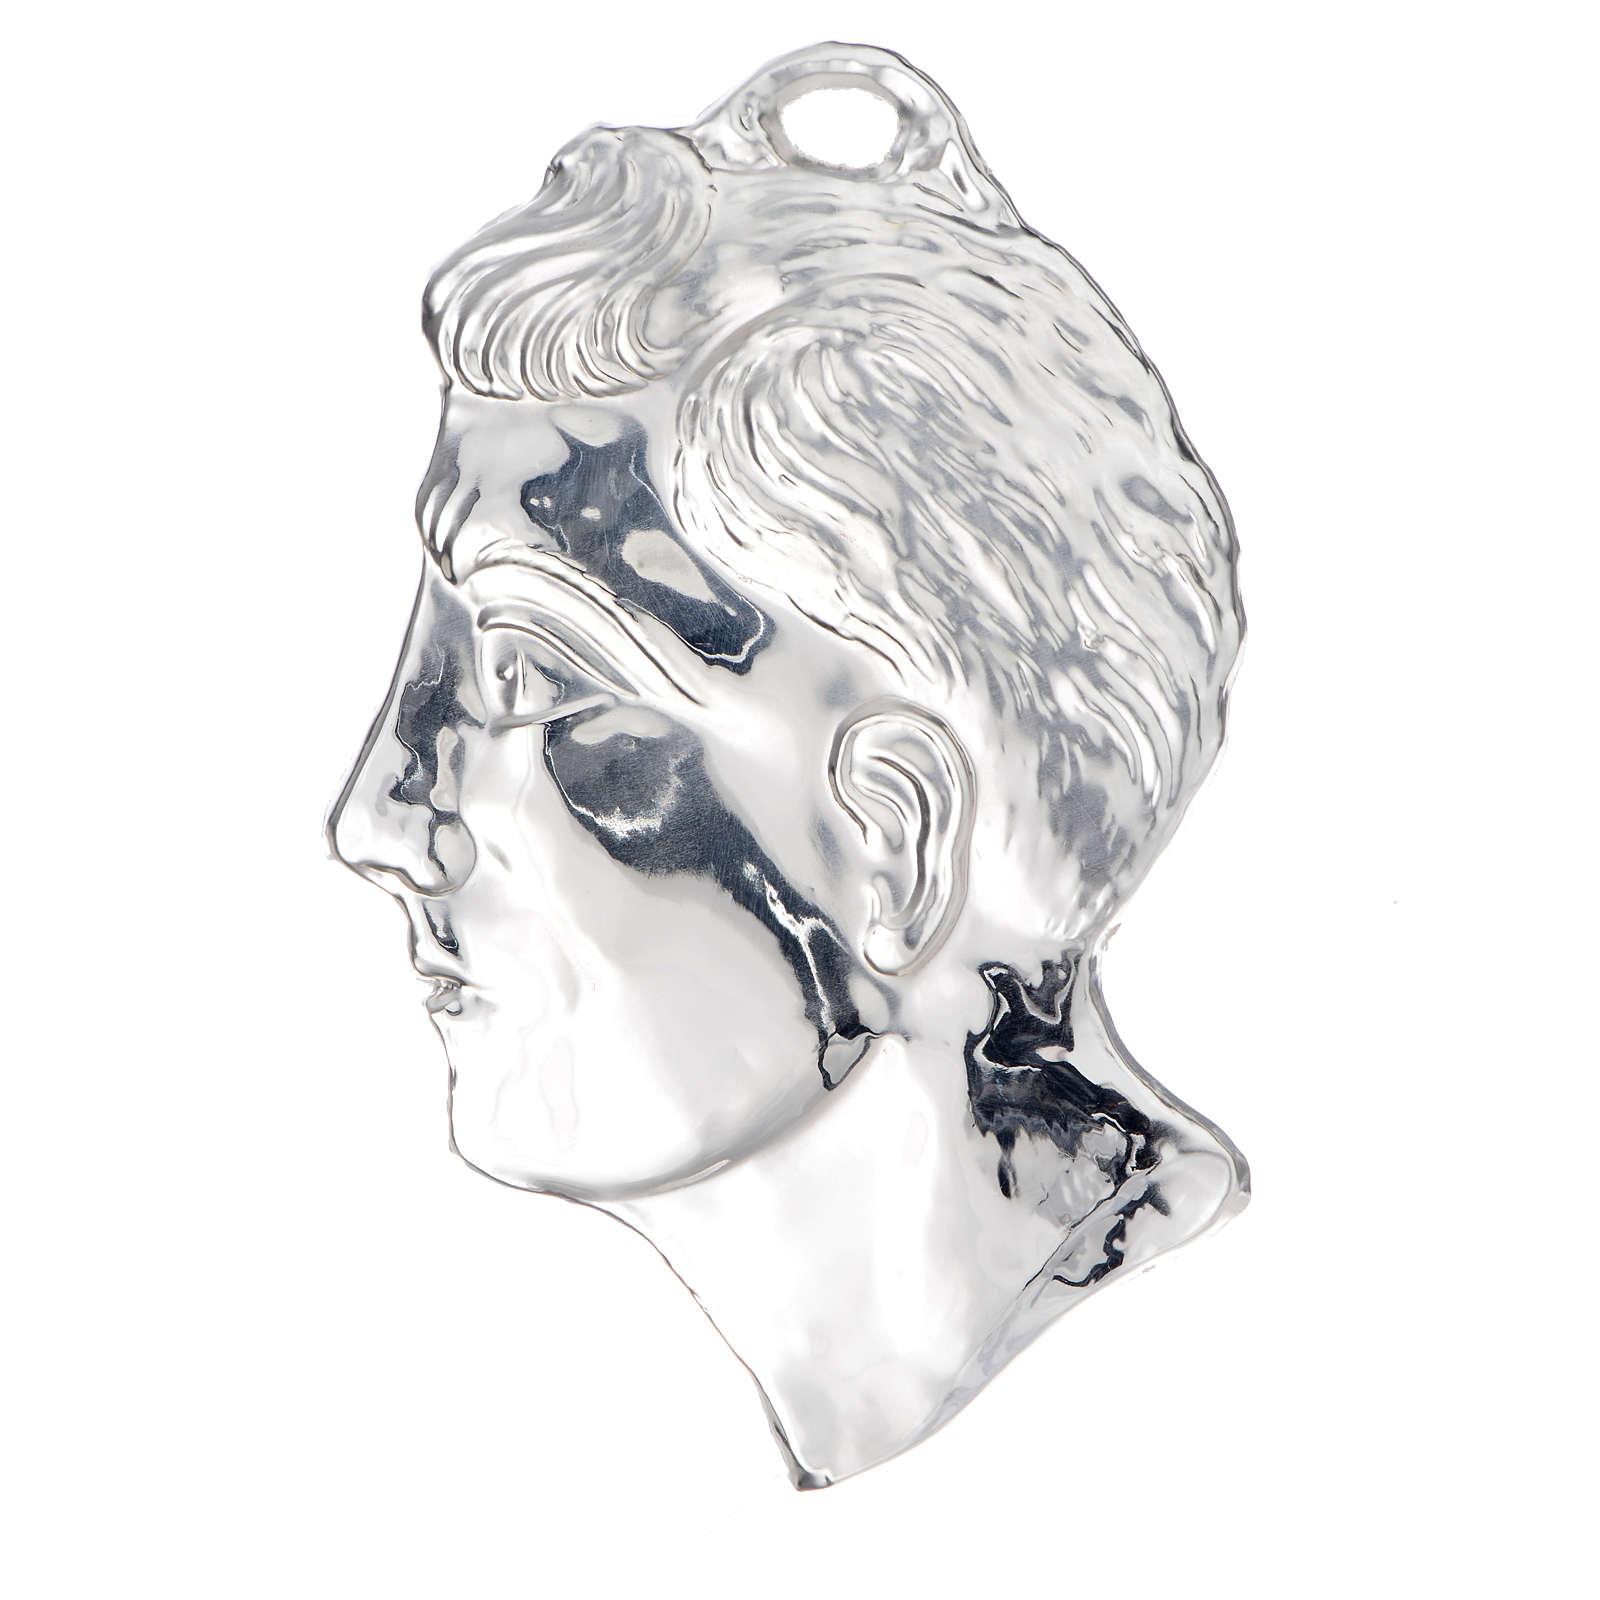 Ex voto testa di uomo argento 925 o metallo 13 cm 3